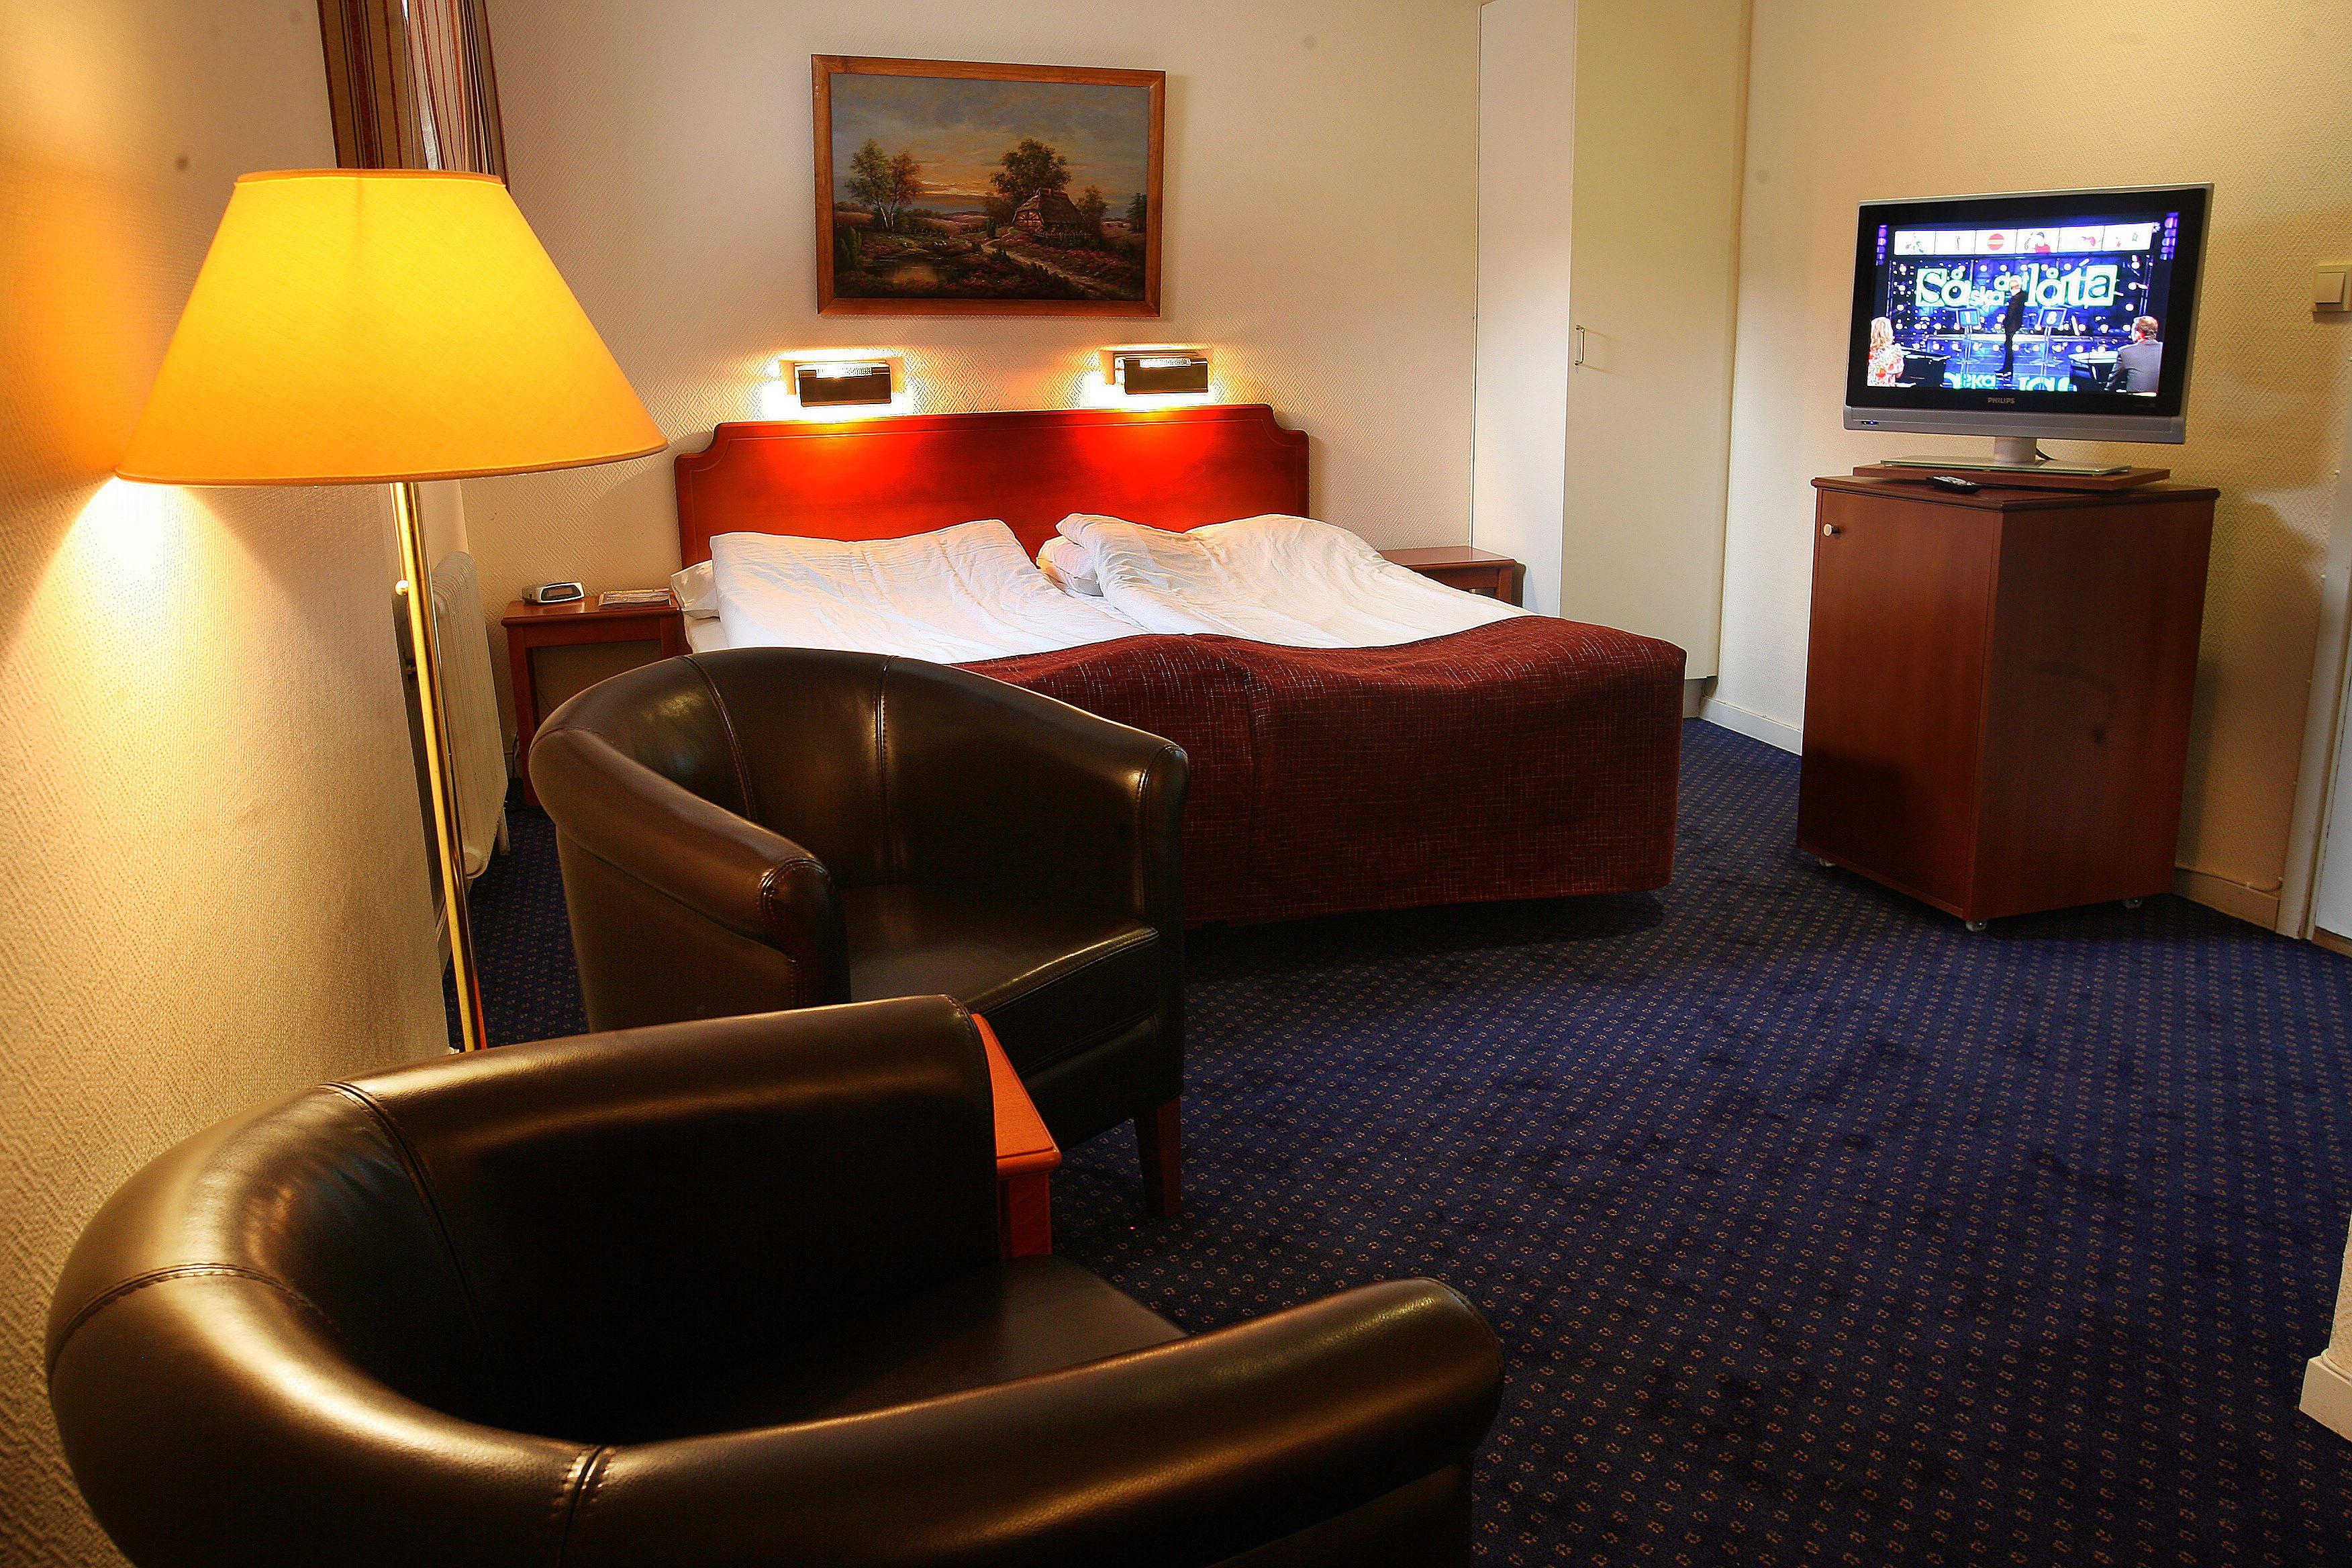 Hotell Drott, Norrköping